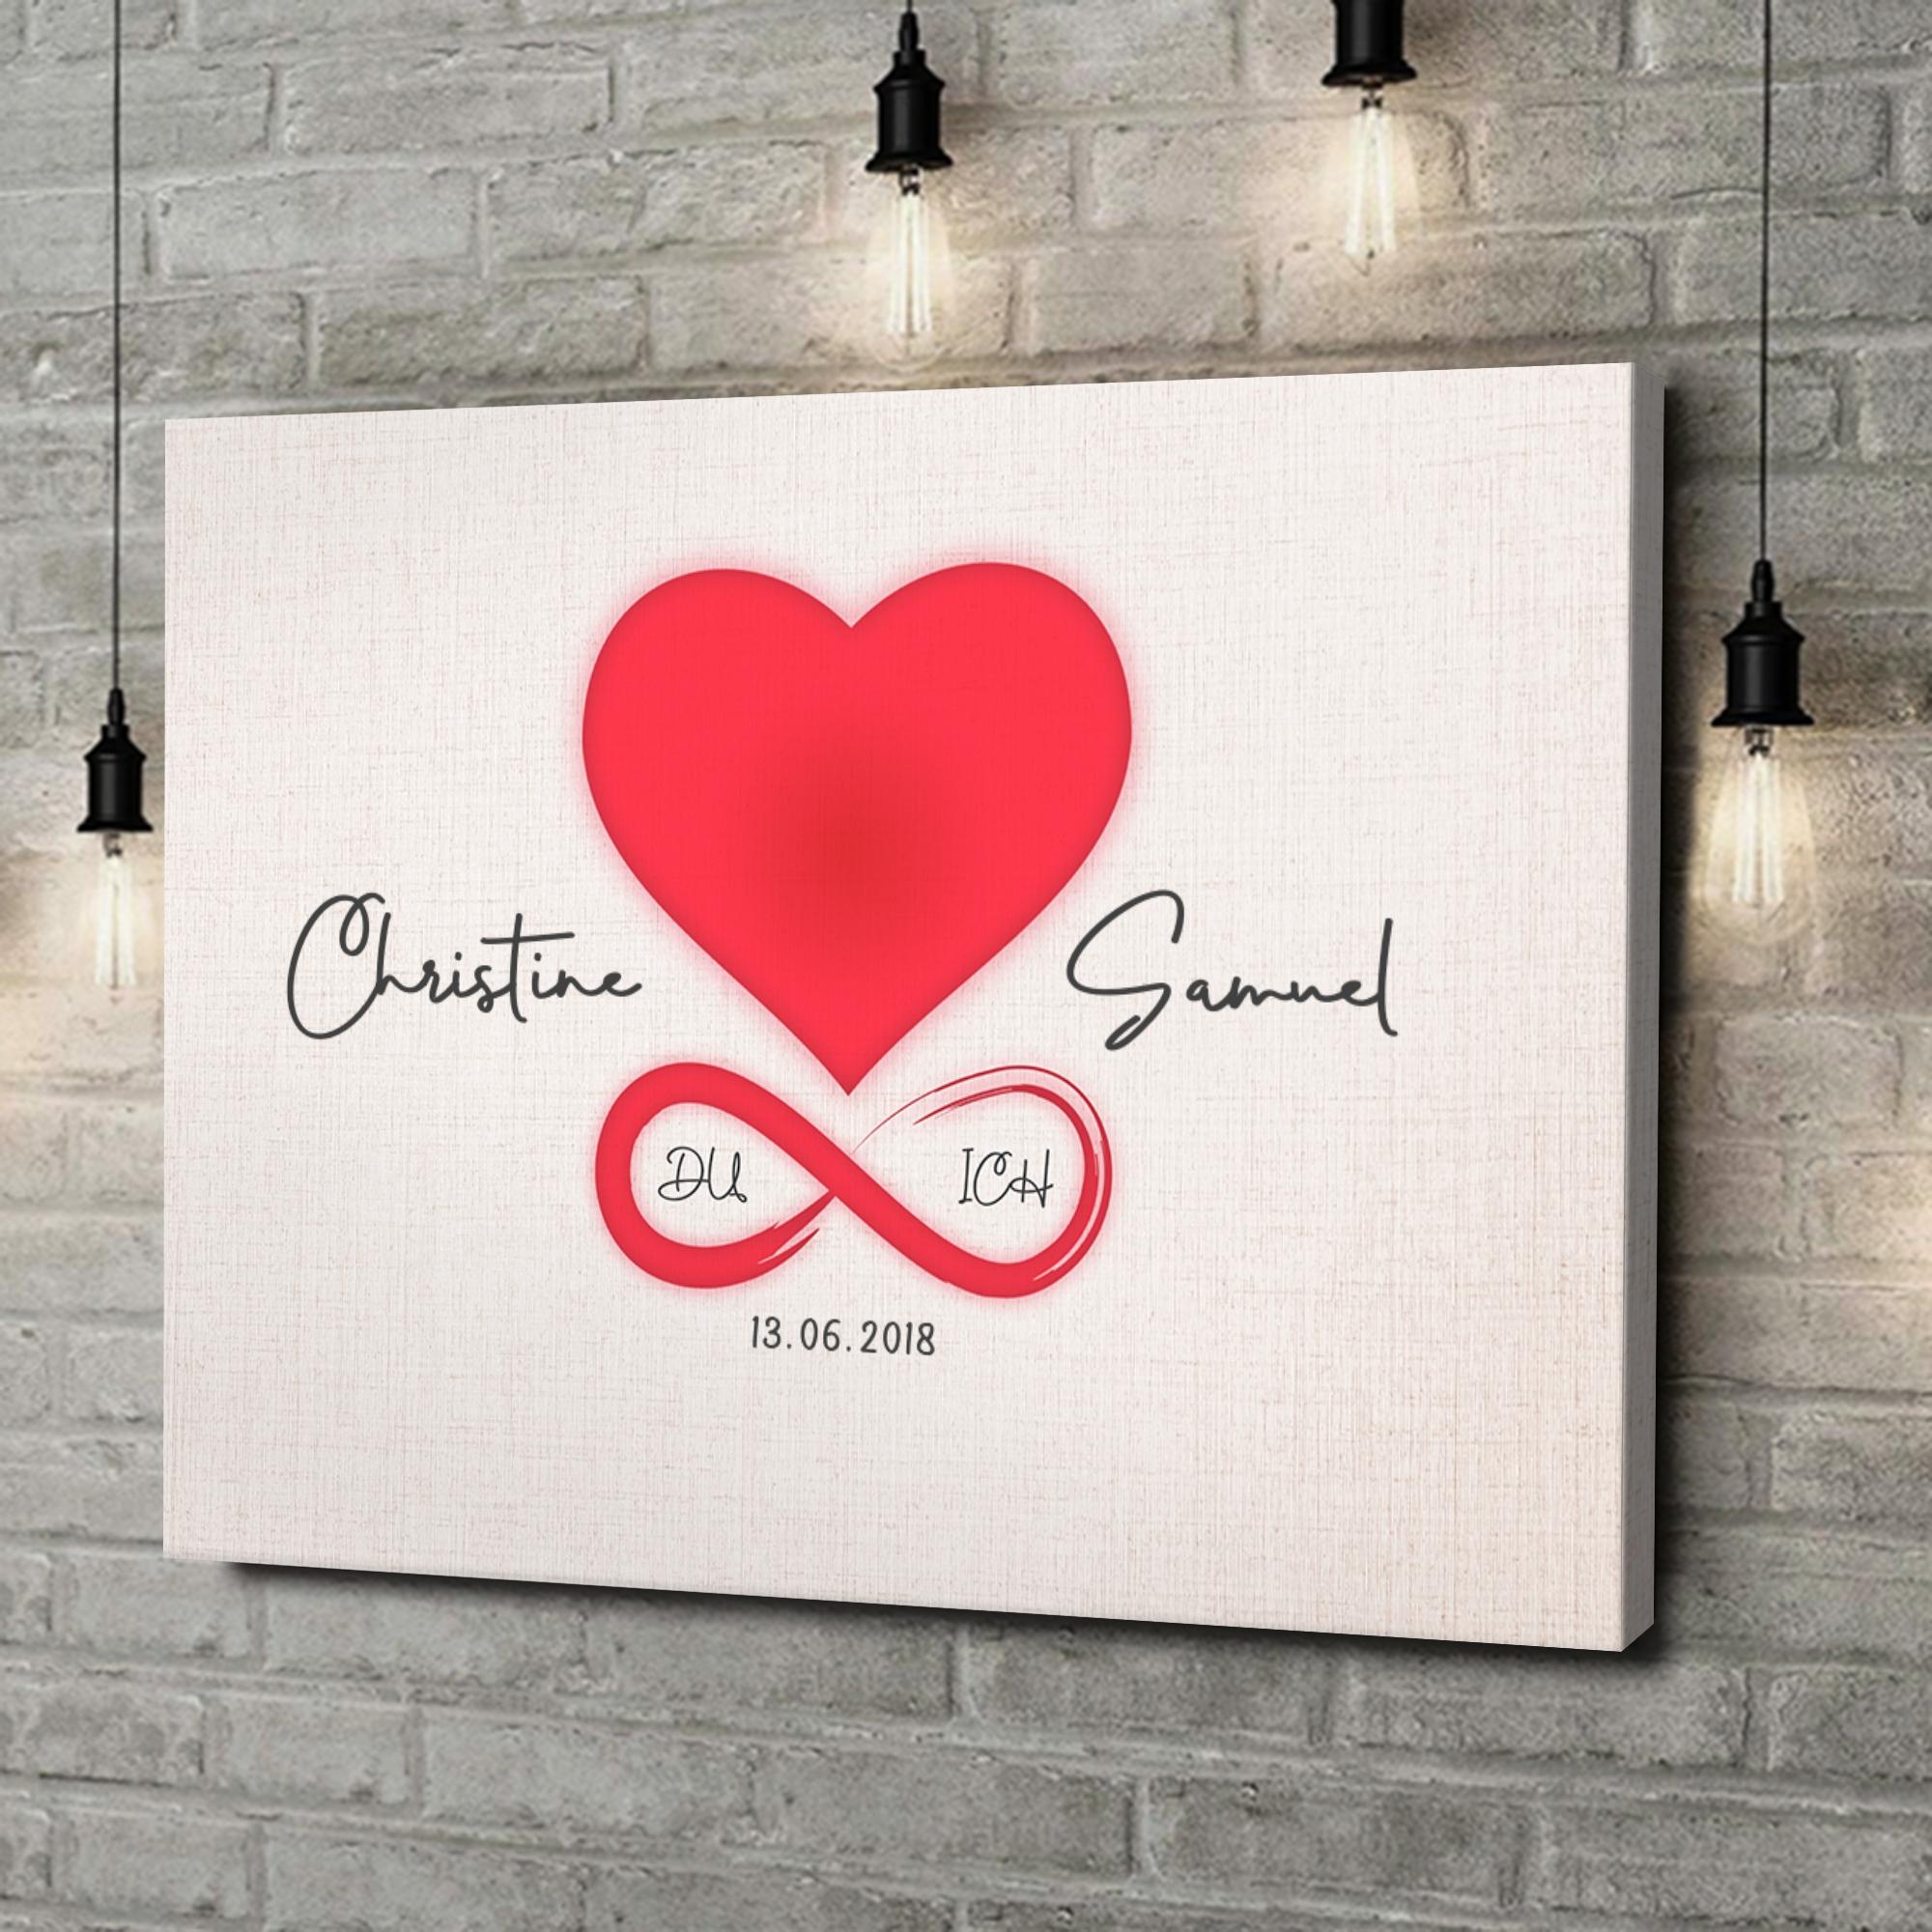 Leinwandbild personalisiert Liebe des Lebens